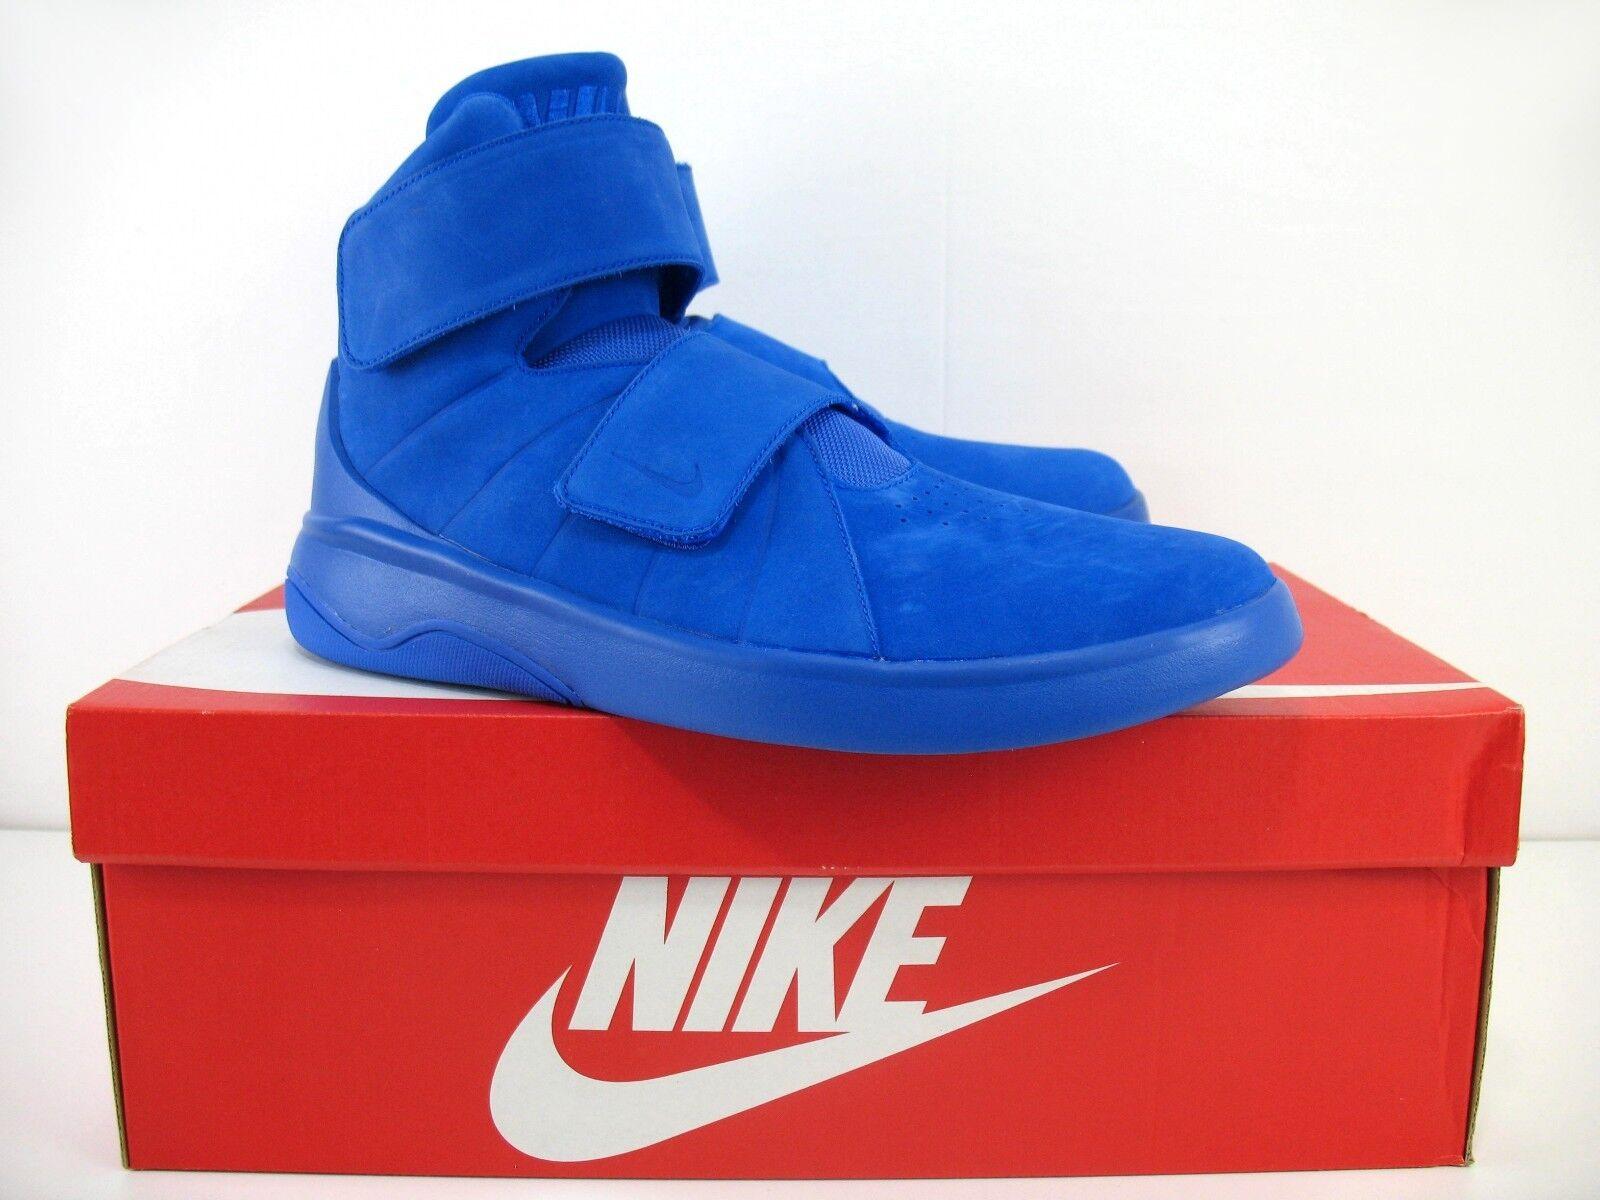 Nike Marxman Premium PRM Racer Blue Hi Tops With Box - 832766-400 - Sz 10.5 New